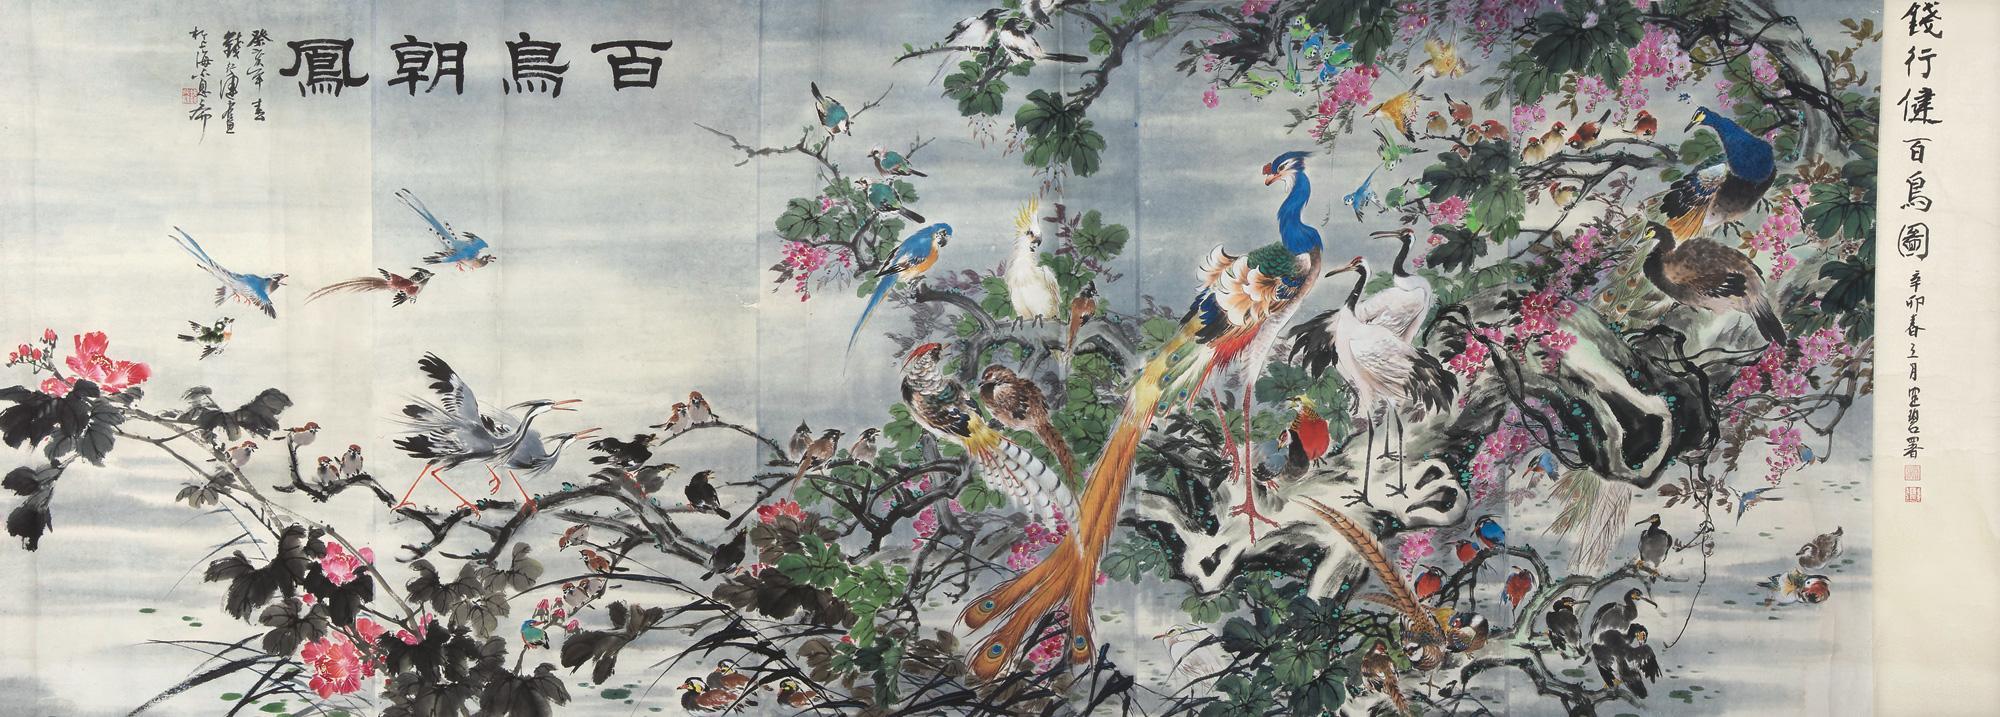 Artist: Qian Xingjian钱行健 124 x 232 cm Chinese ink on rice paper image source:http://auction.artron.net/paimai-art5013260236/